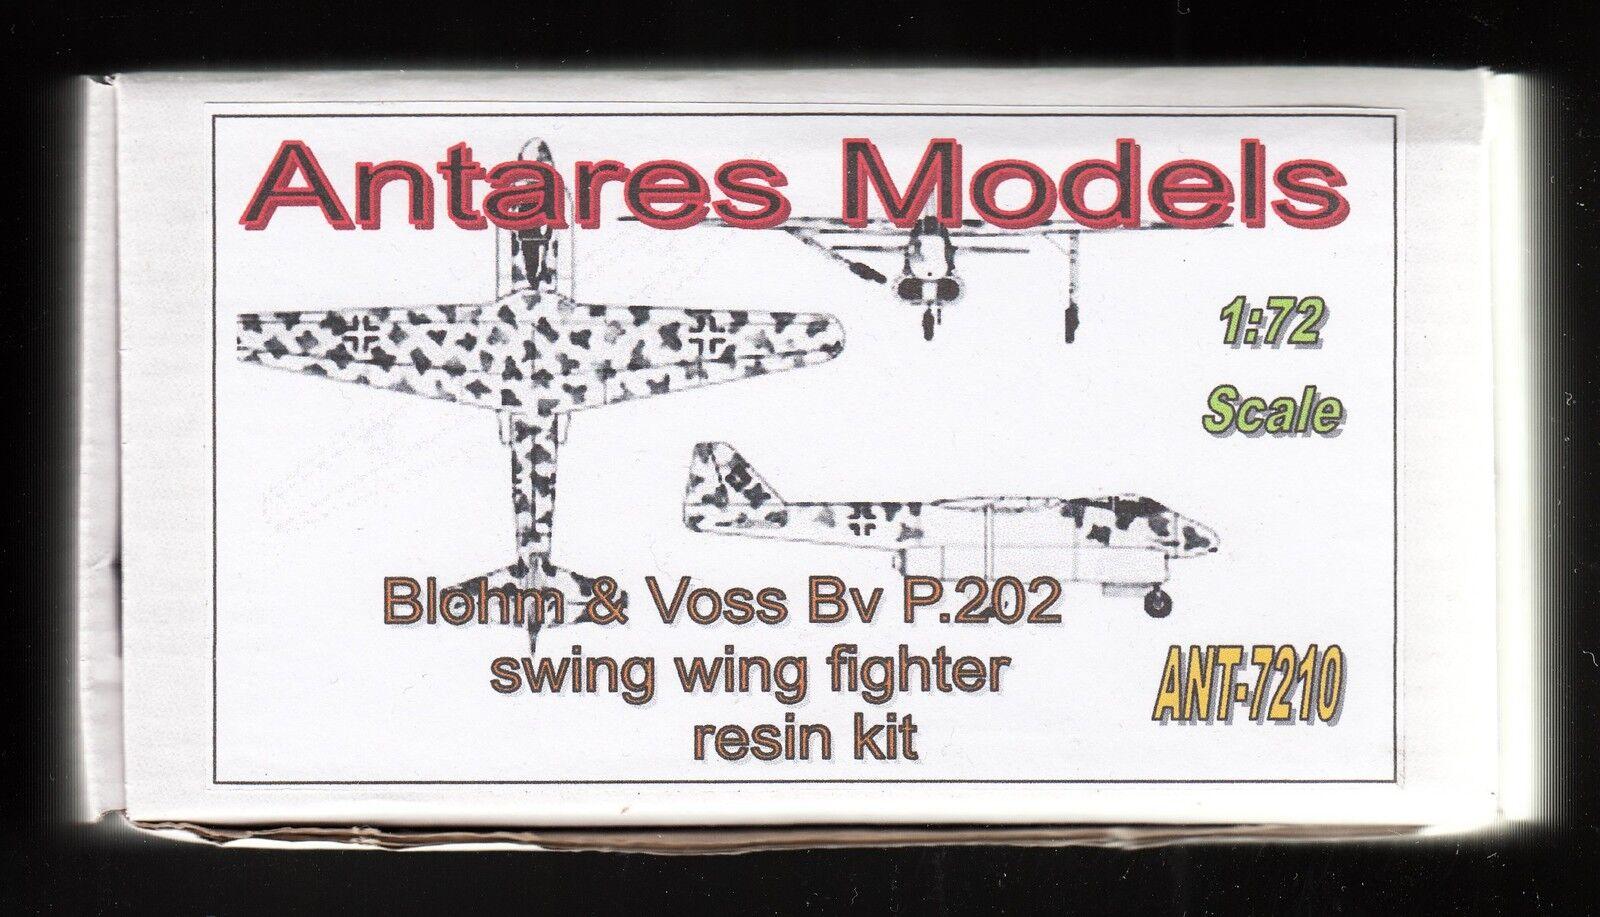 Ant7210  ANTARES - Jägerprojekt Blohm & Voss Bv P.202 - Resin - 1 72 - SELTEN  | Kunde zuerst